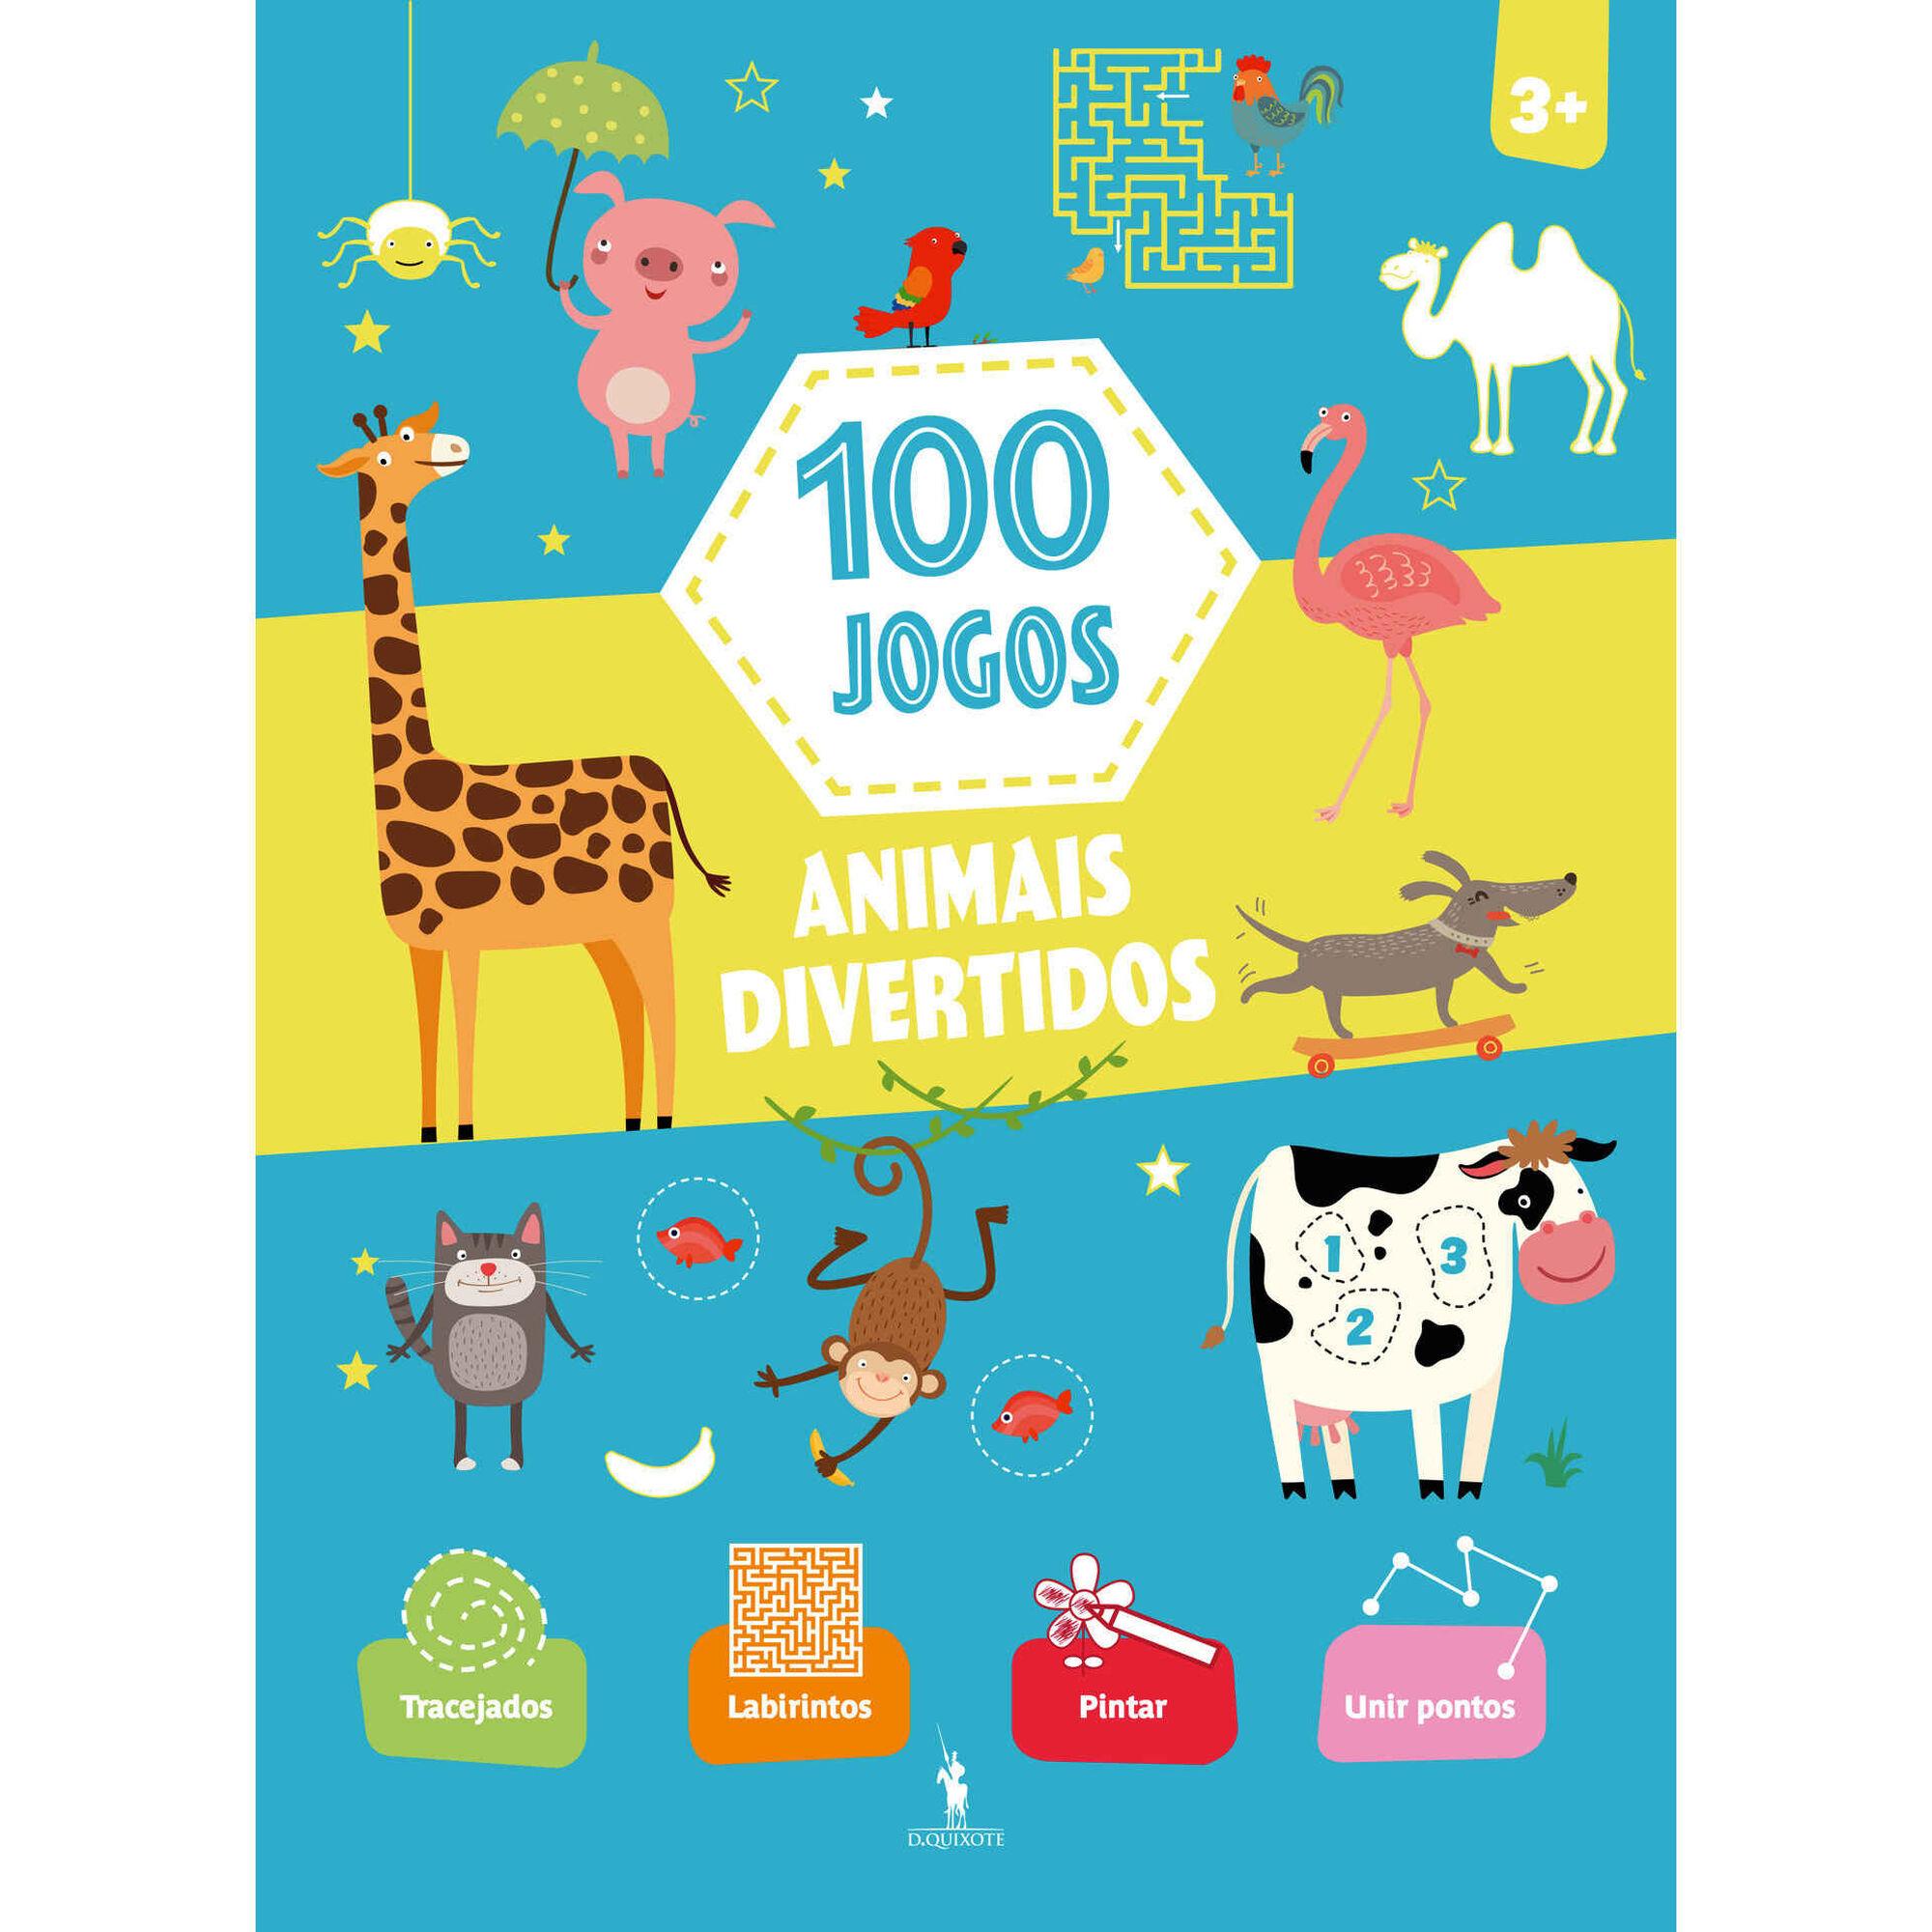 100 Jogos - Animais Divertidos